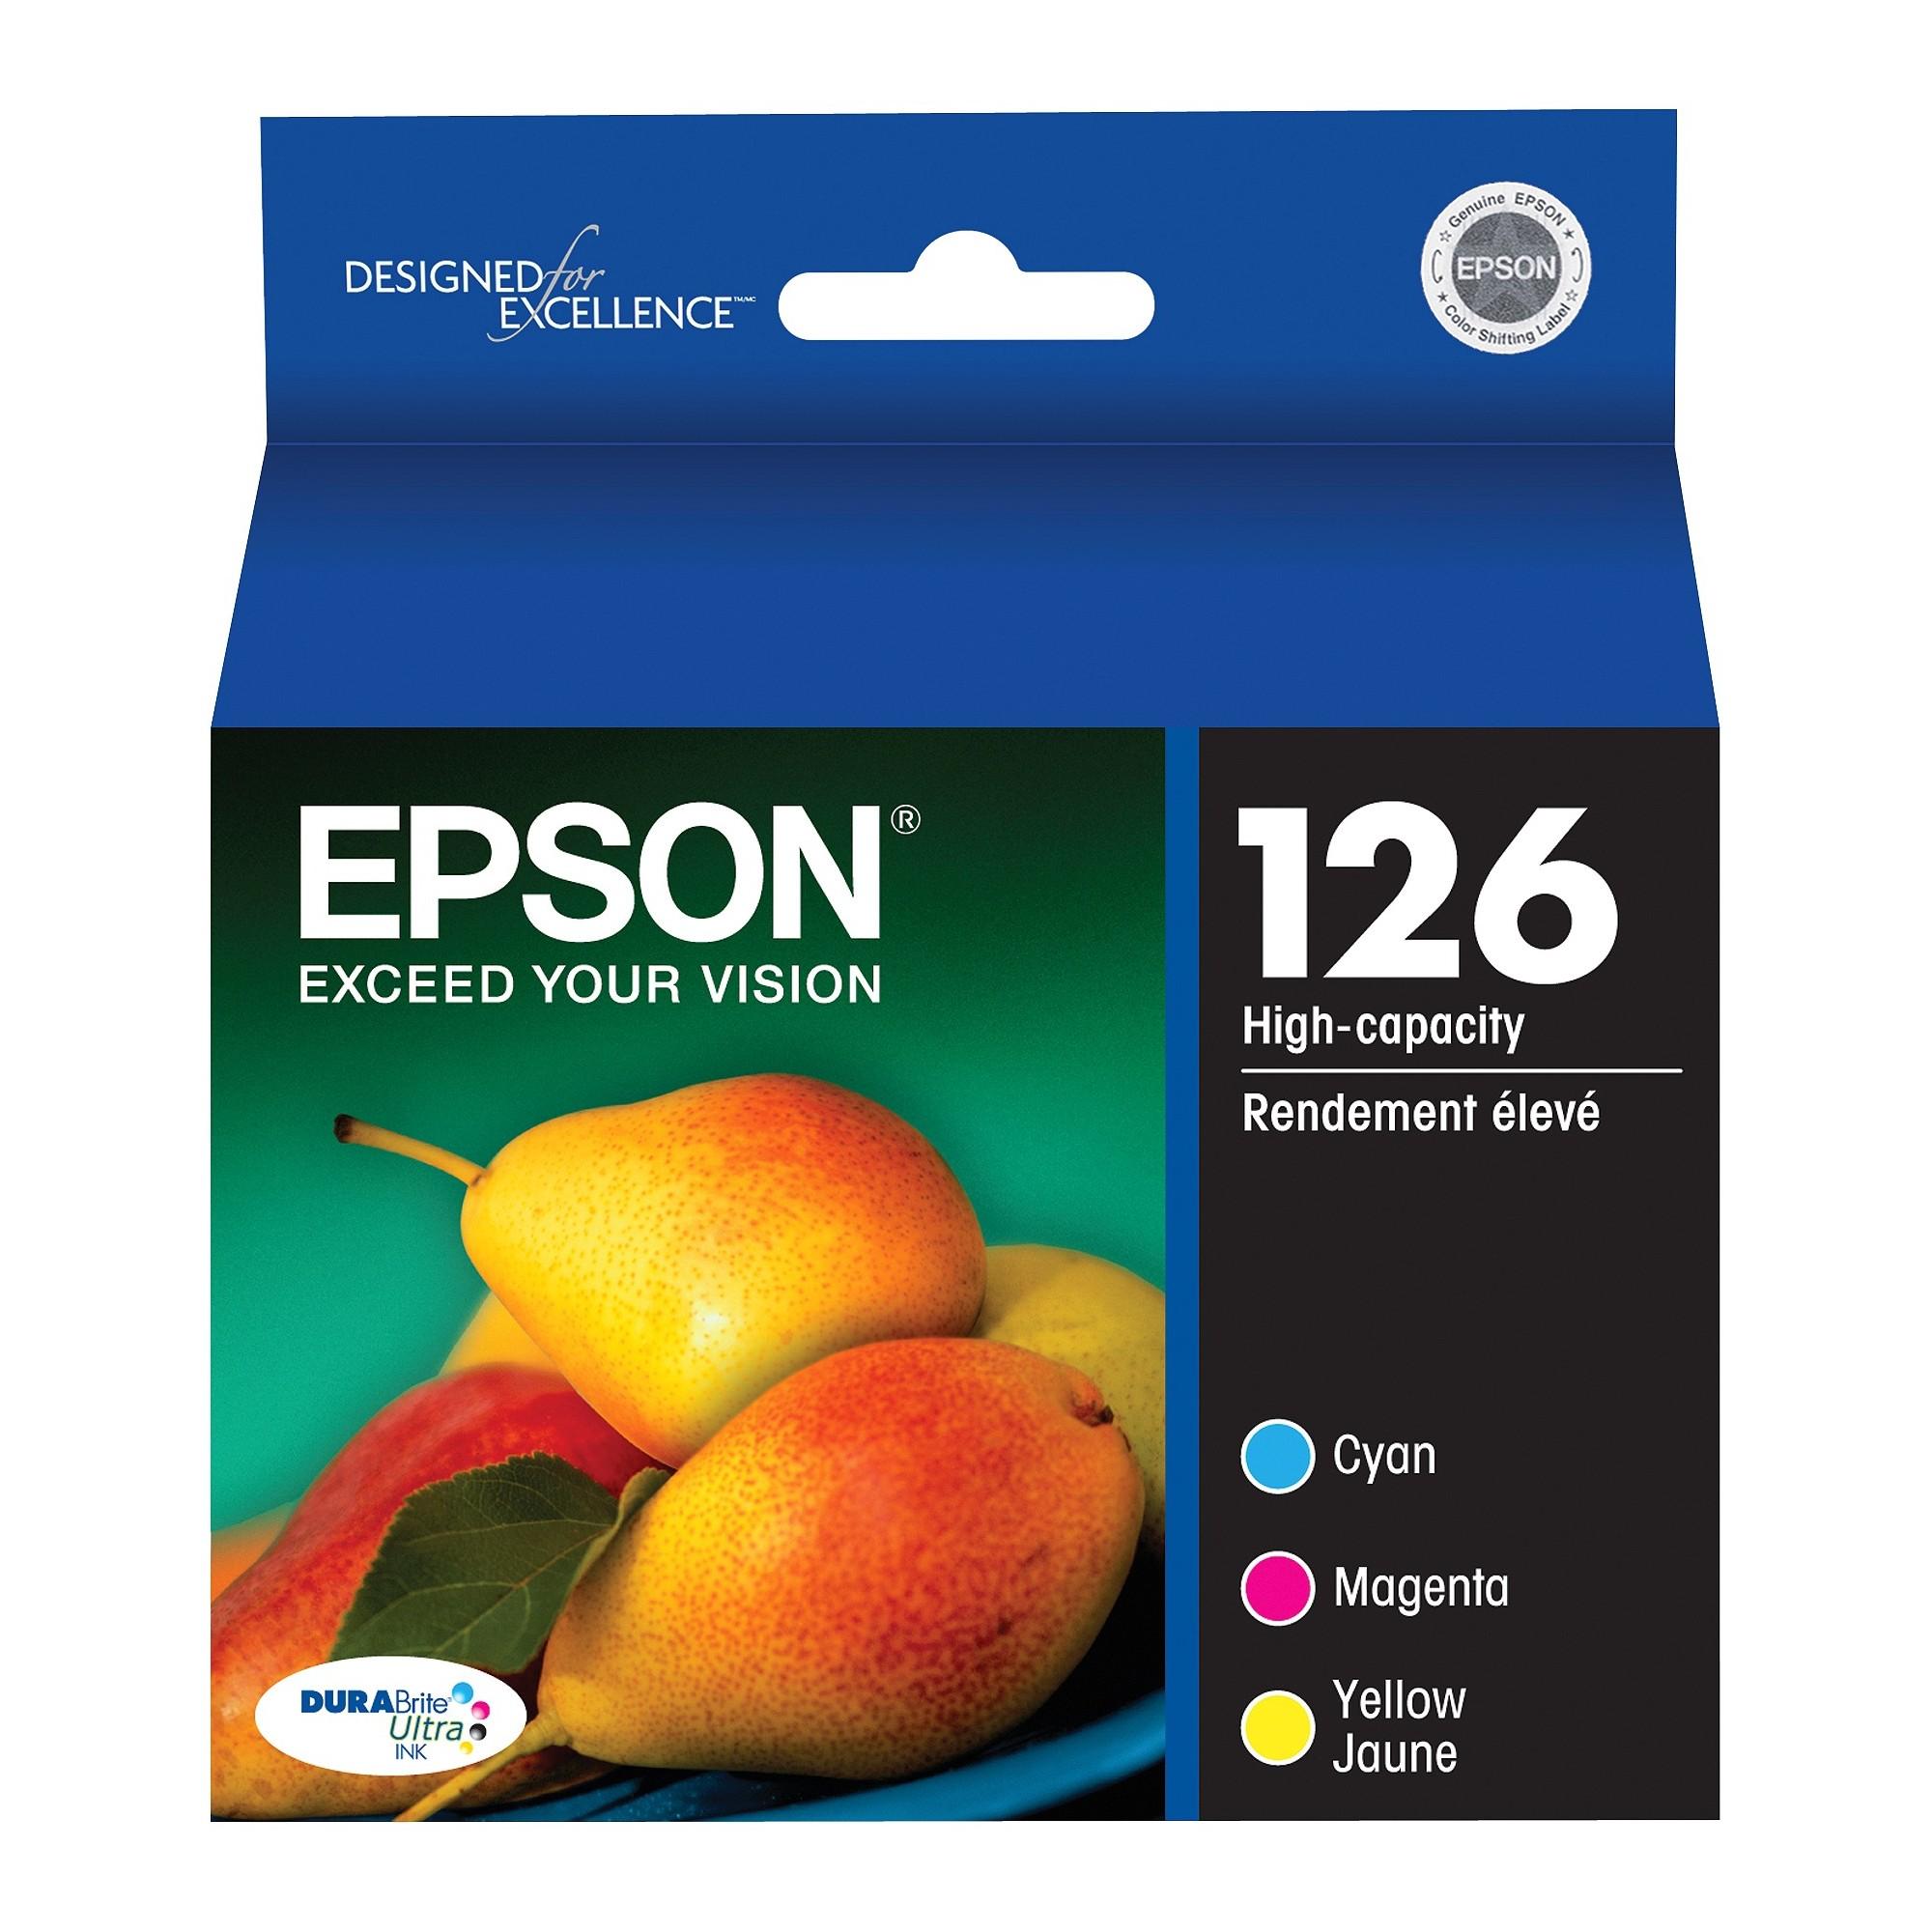 Epson 126 Color Ink Cartridges Products Pinterest Toner Tinta 126a Cmyk Hp Laserjet